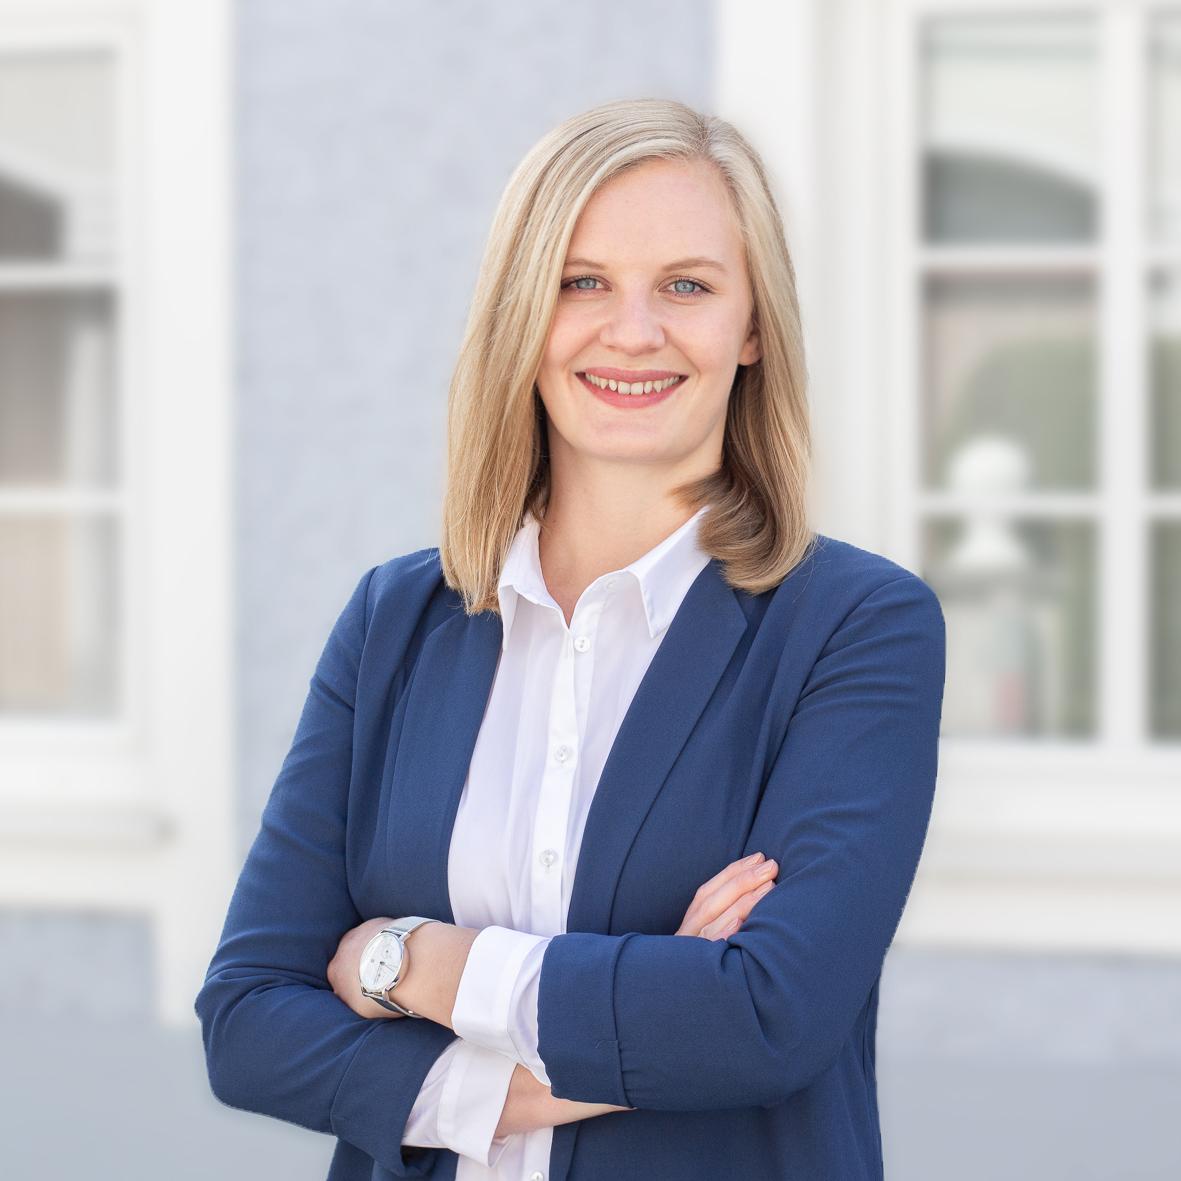 Mag. Vanessa Dörfel - Notariatskandidatin im Notariat Grünburg